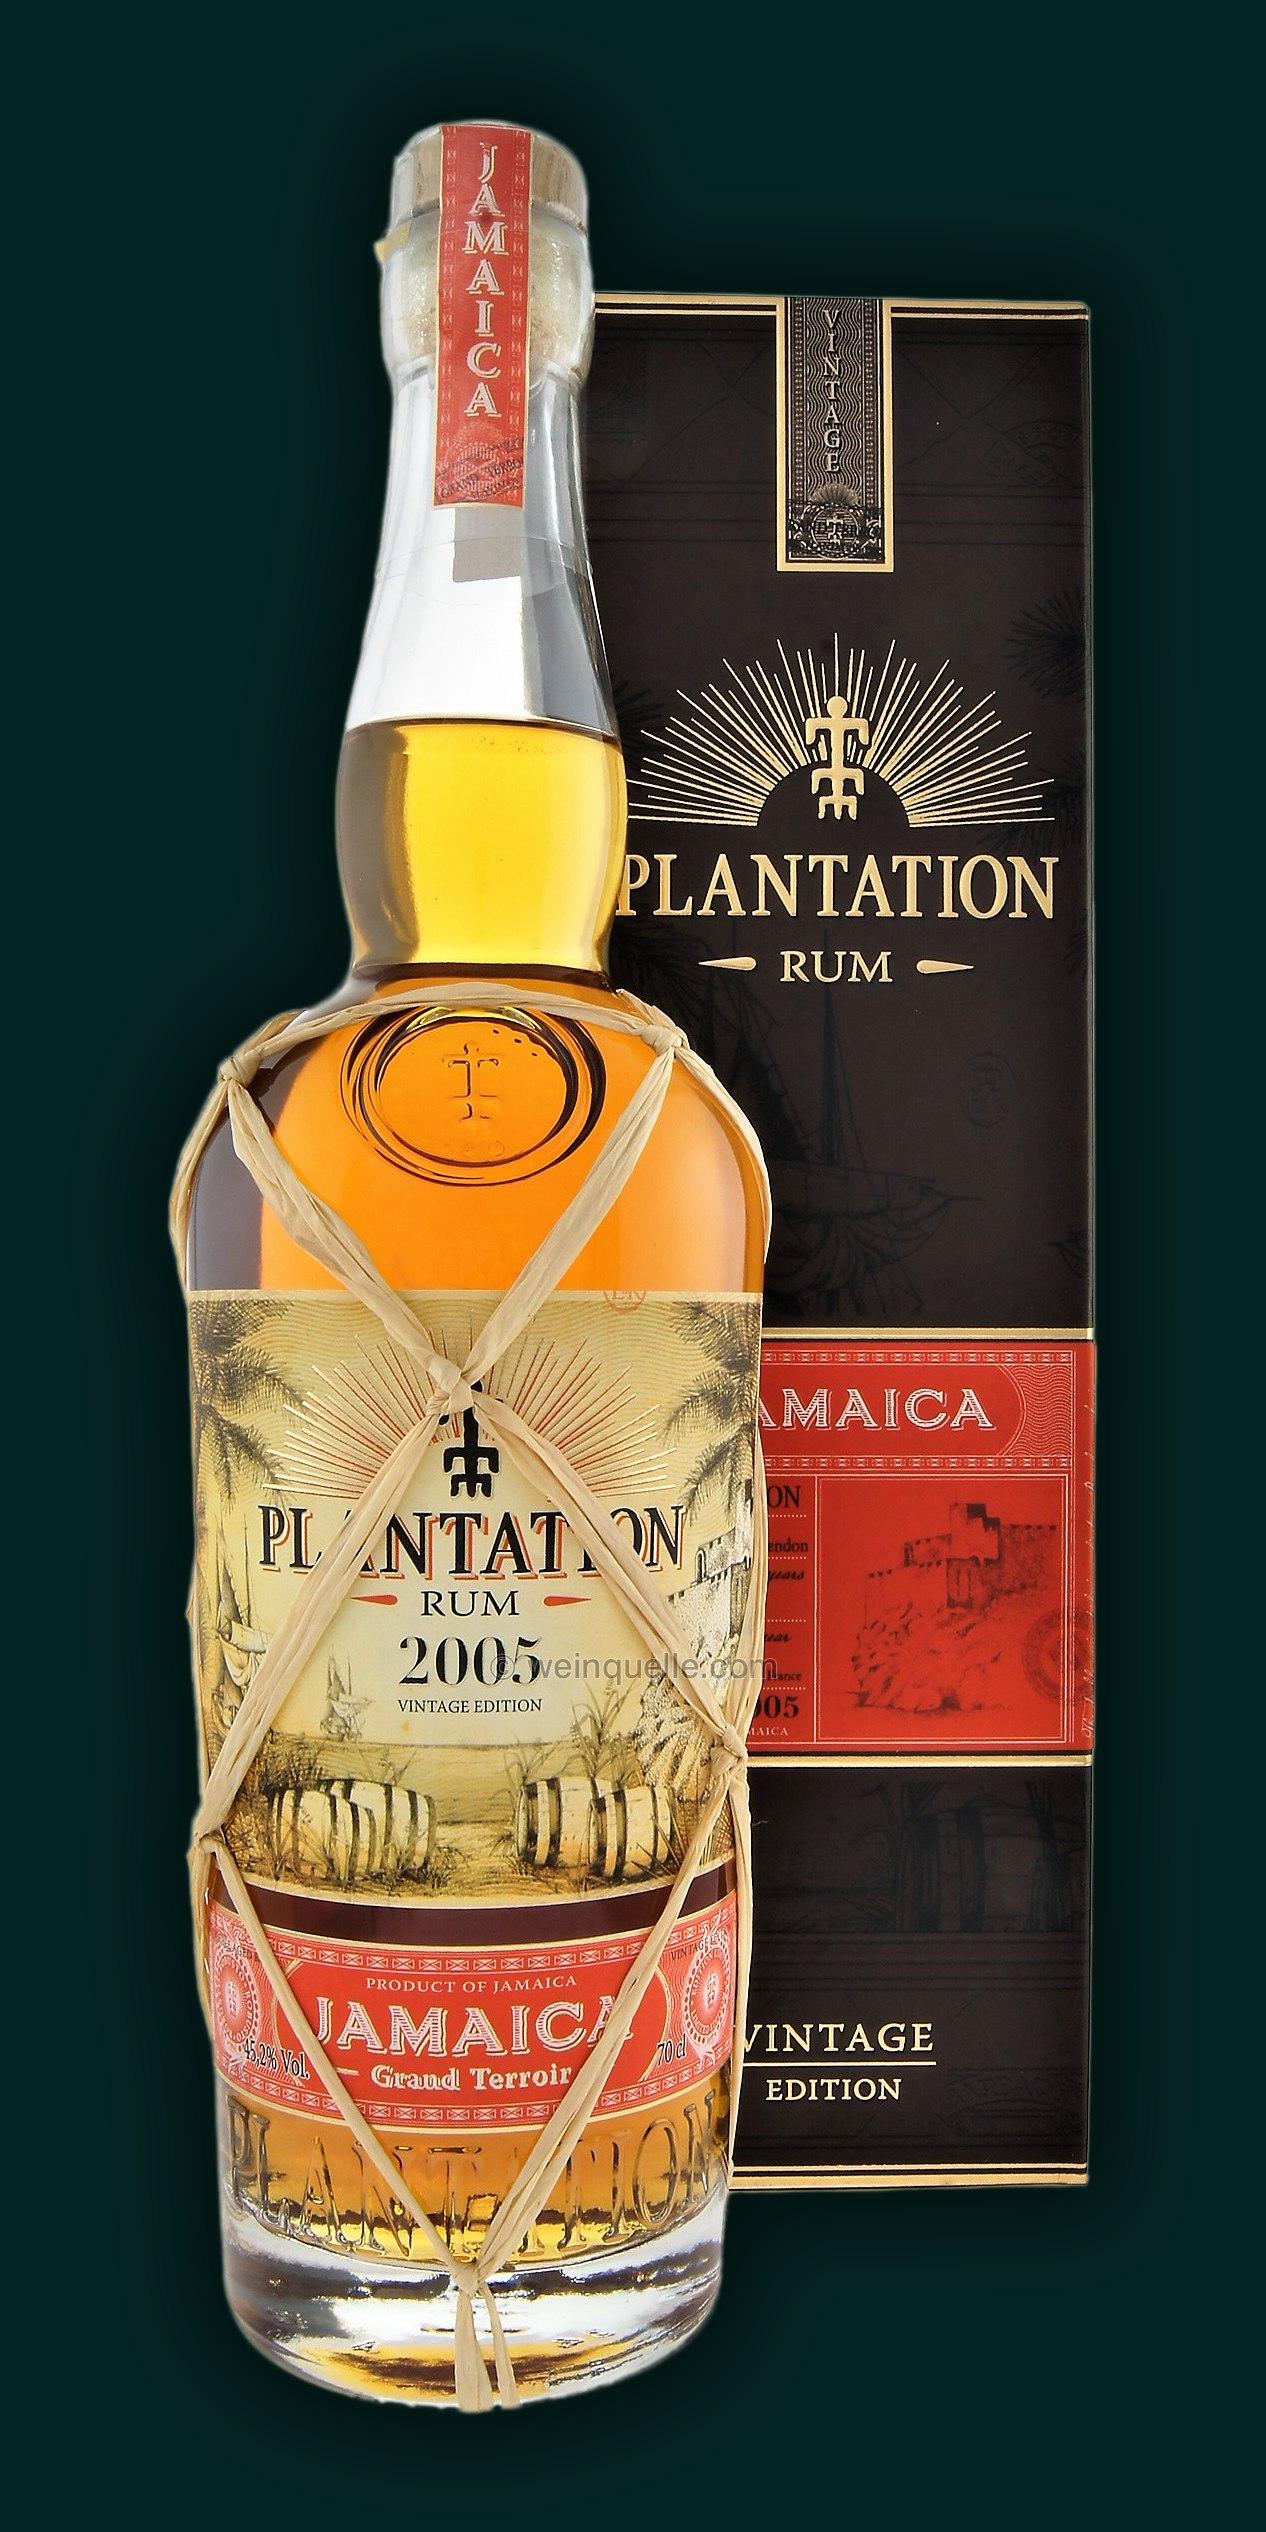 Plantation Jamaica Rum Vintage Edition 2005, 36,90 ...